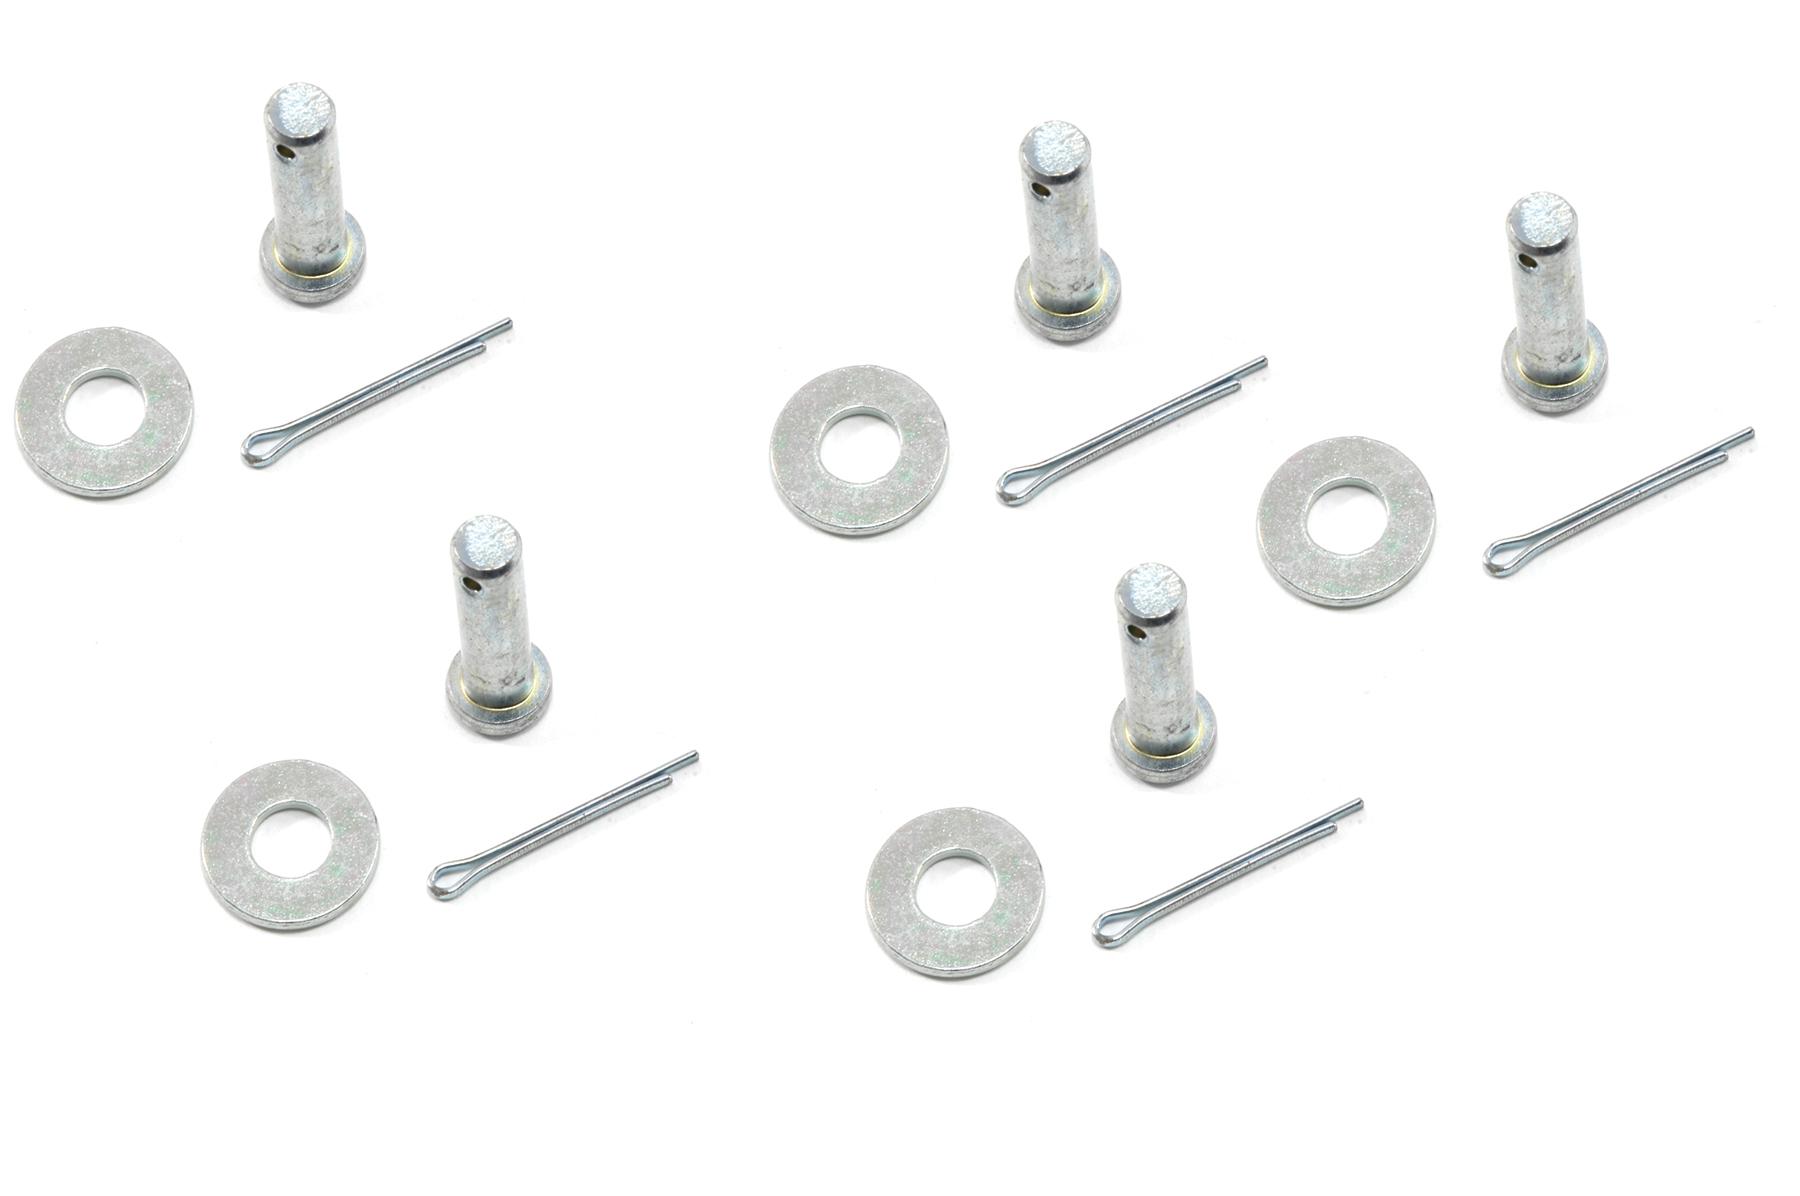 Brake Pedal Clevis Pin Kit